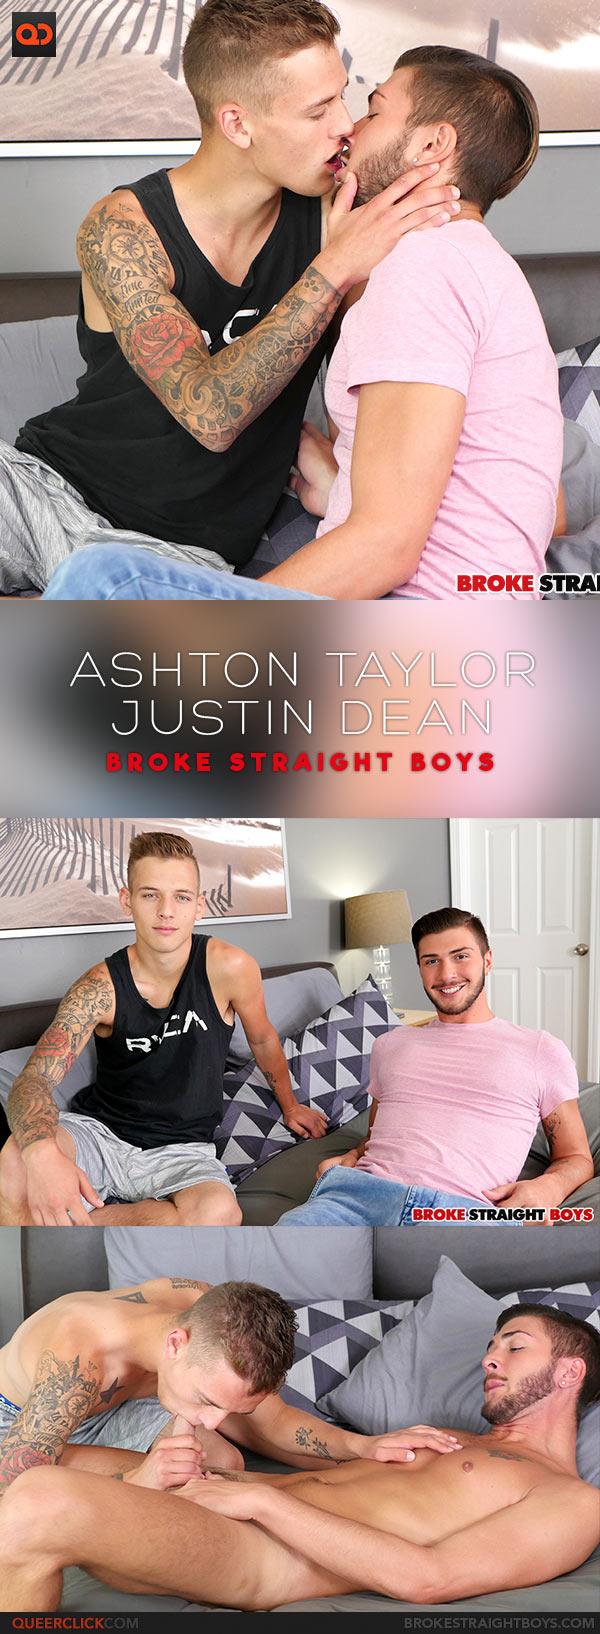 Broke Straight Boys: Ashton Taylor Fucks Justin Dean - Bareback